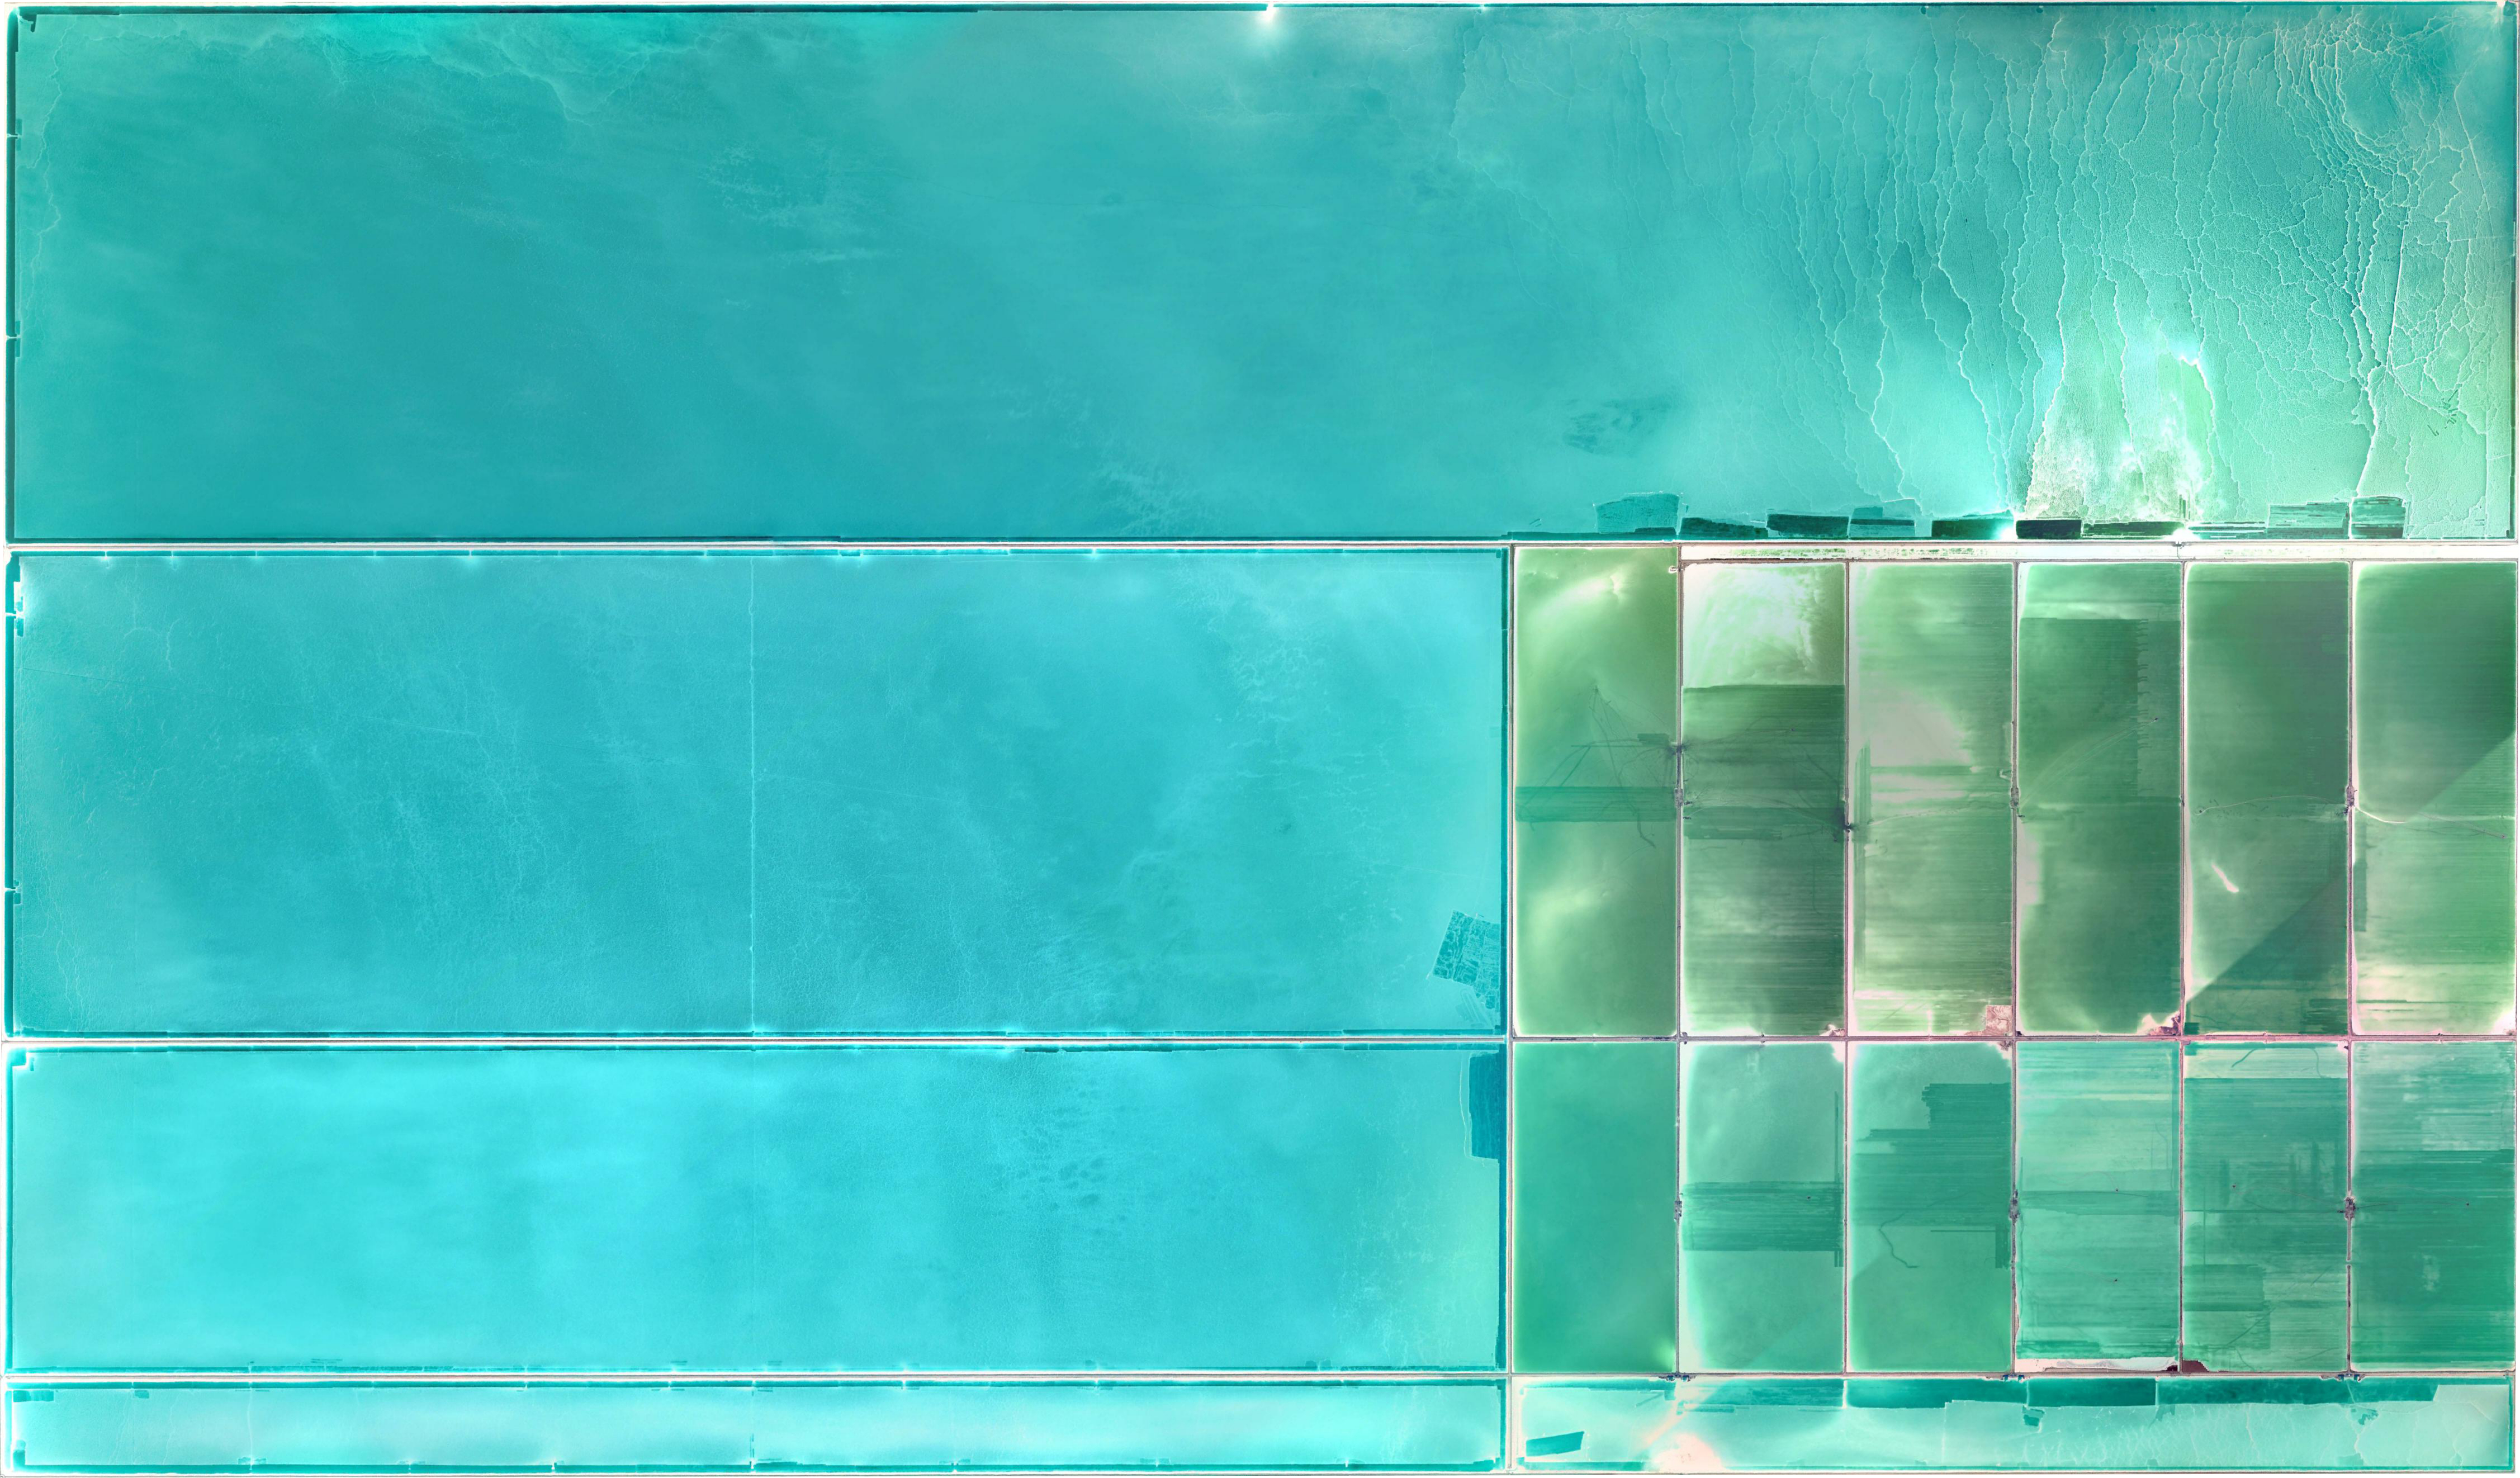 General 4508x2644 China salt flats cyan cyan background Earth water turquoise